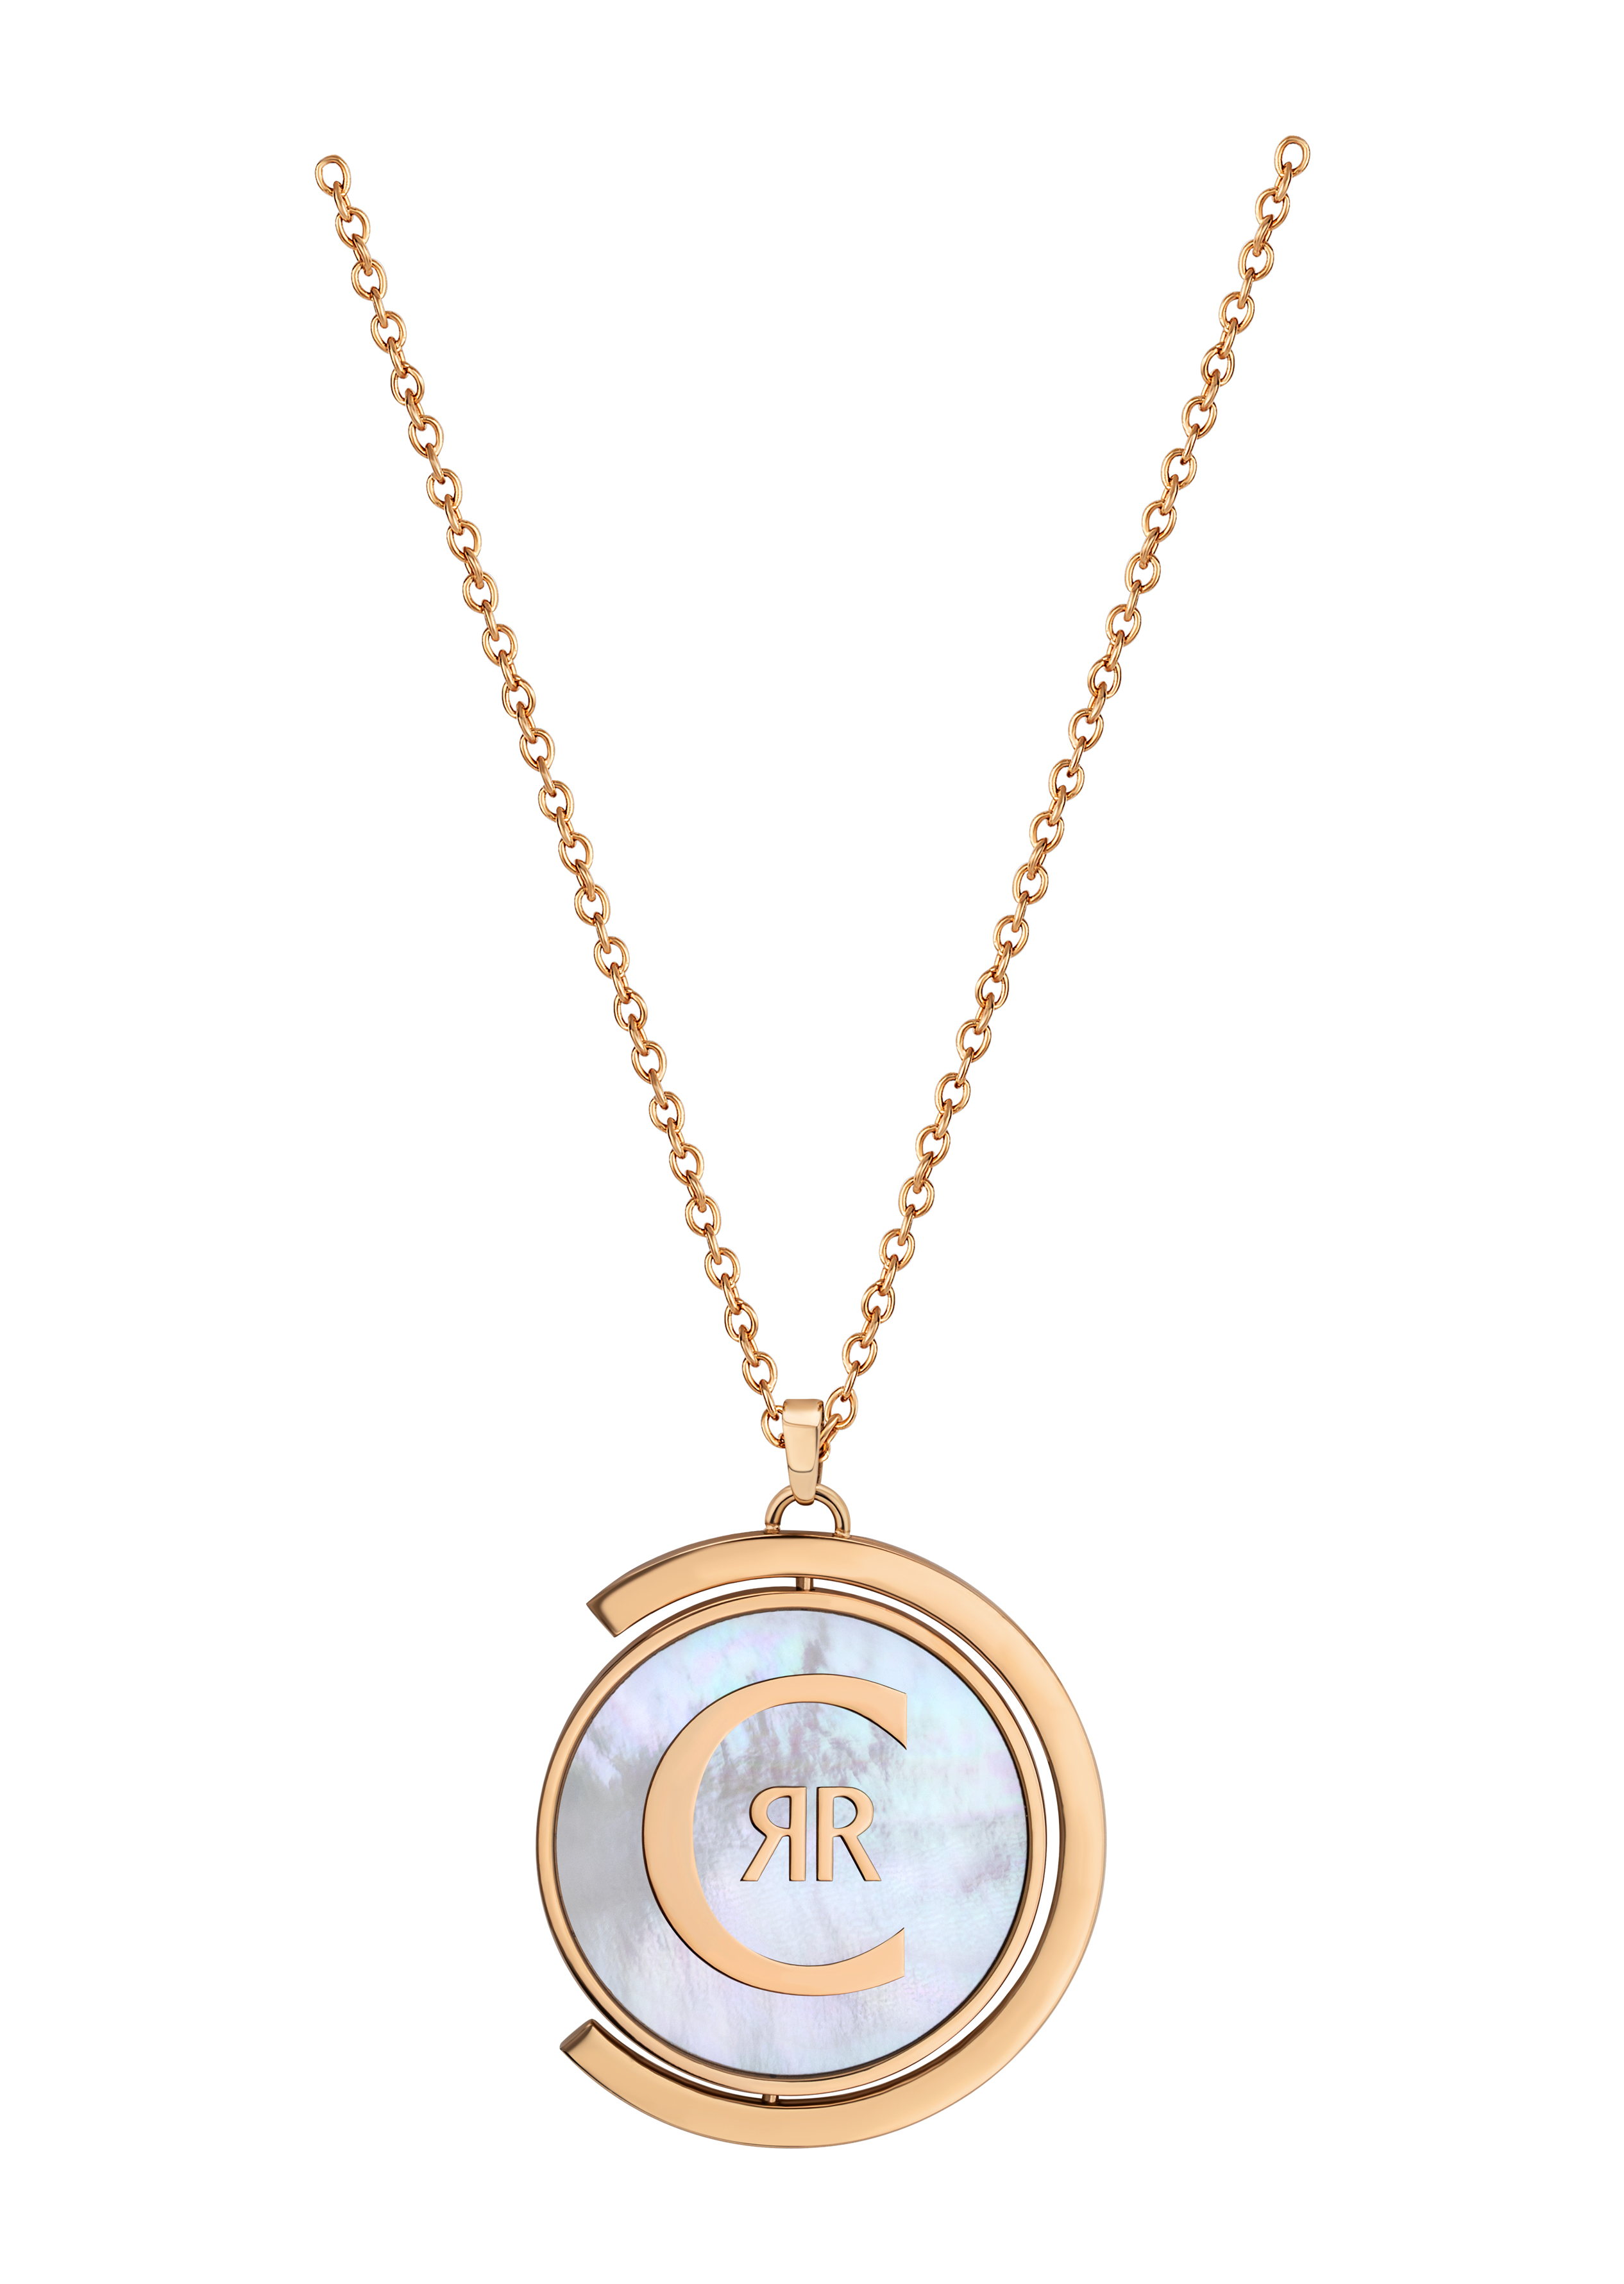 Cerruti Woman Necklace Best Mother's Gift Trafalgar Luxury Jewels